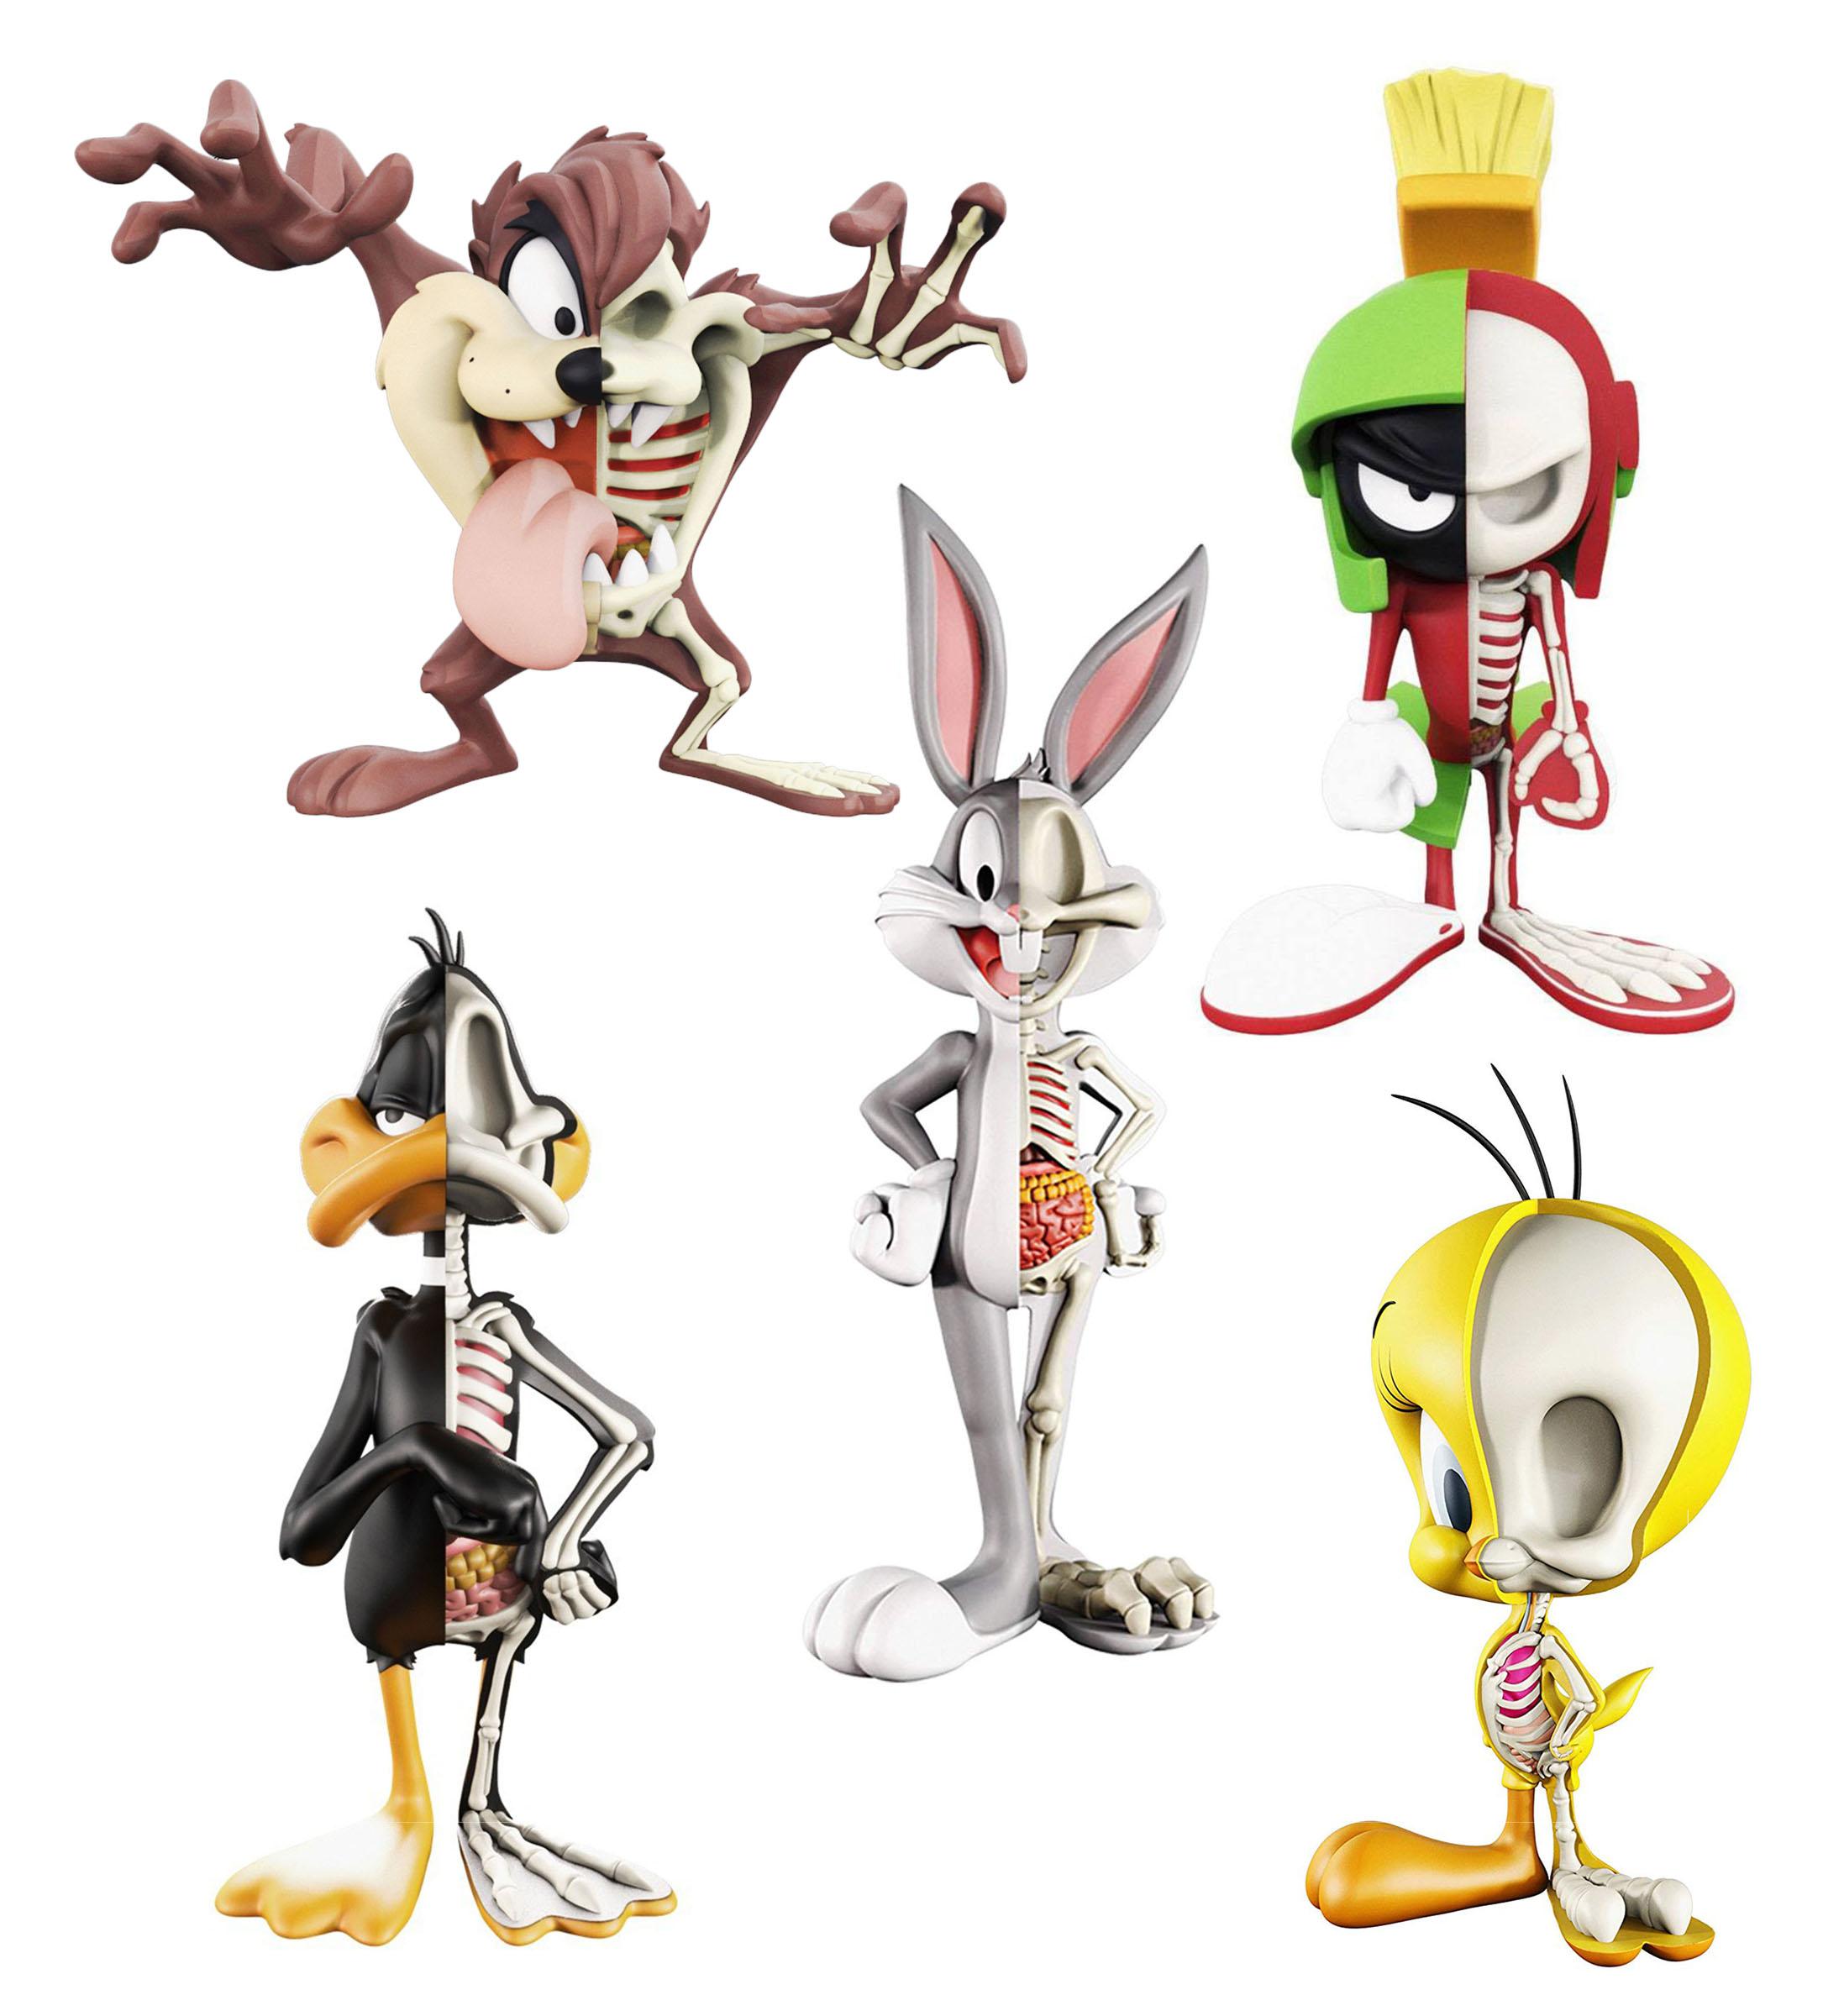 MightyJaxx Jason Freeny Bugs Bunny Fashion Figure Toys Children In Stock Hot